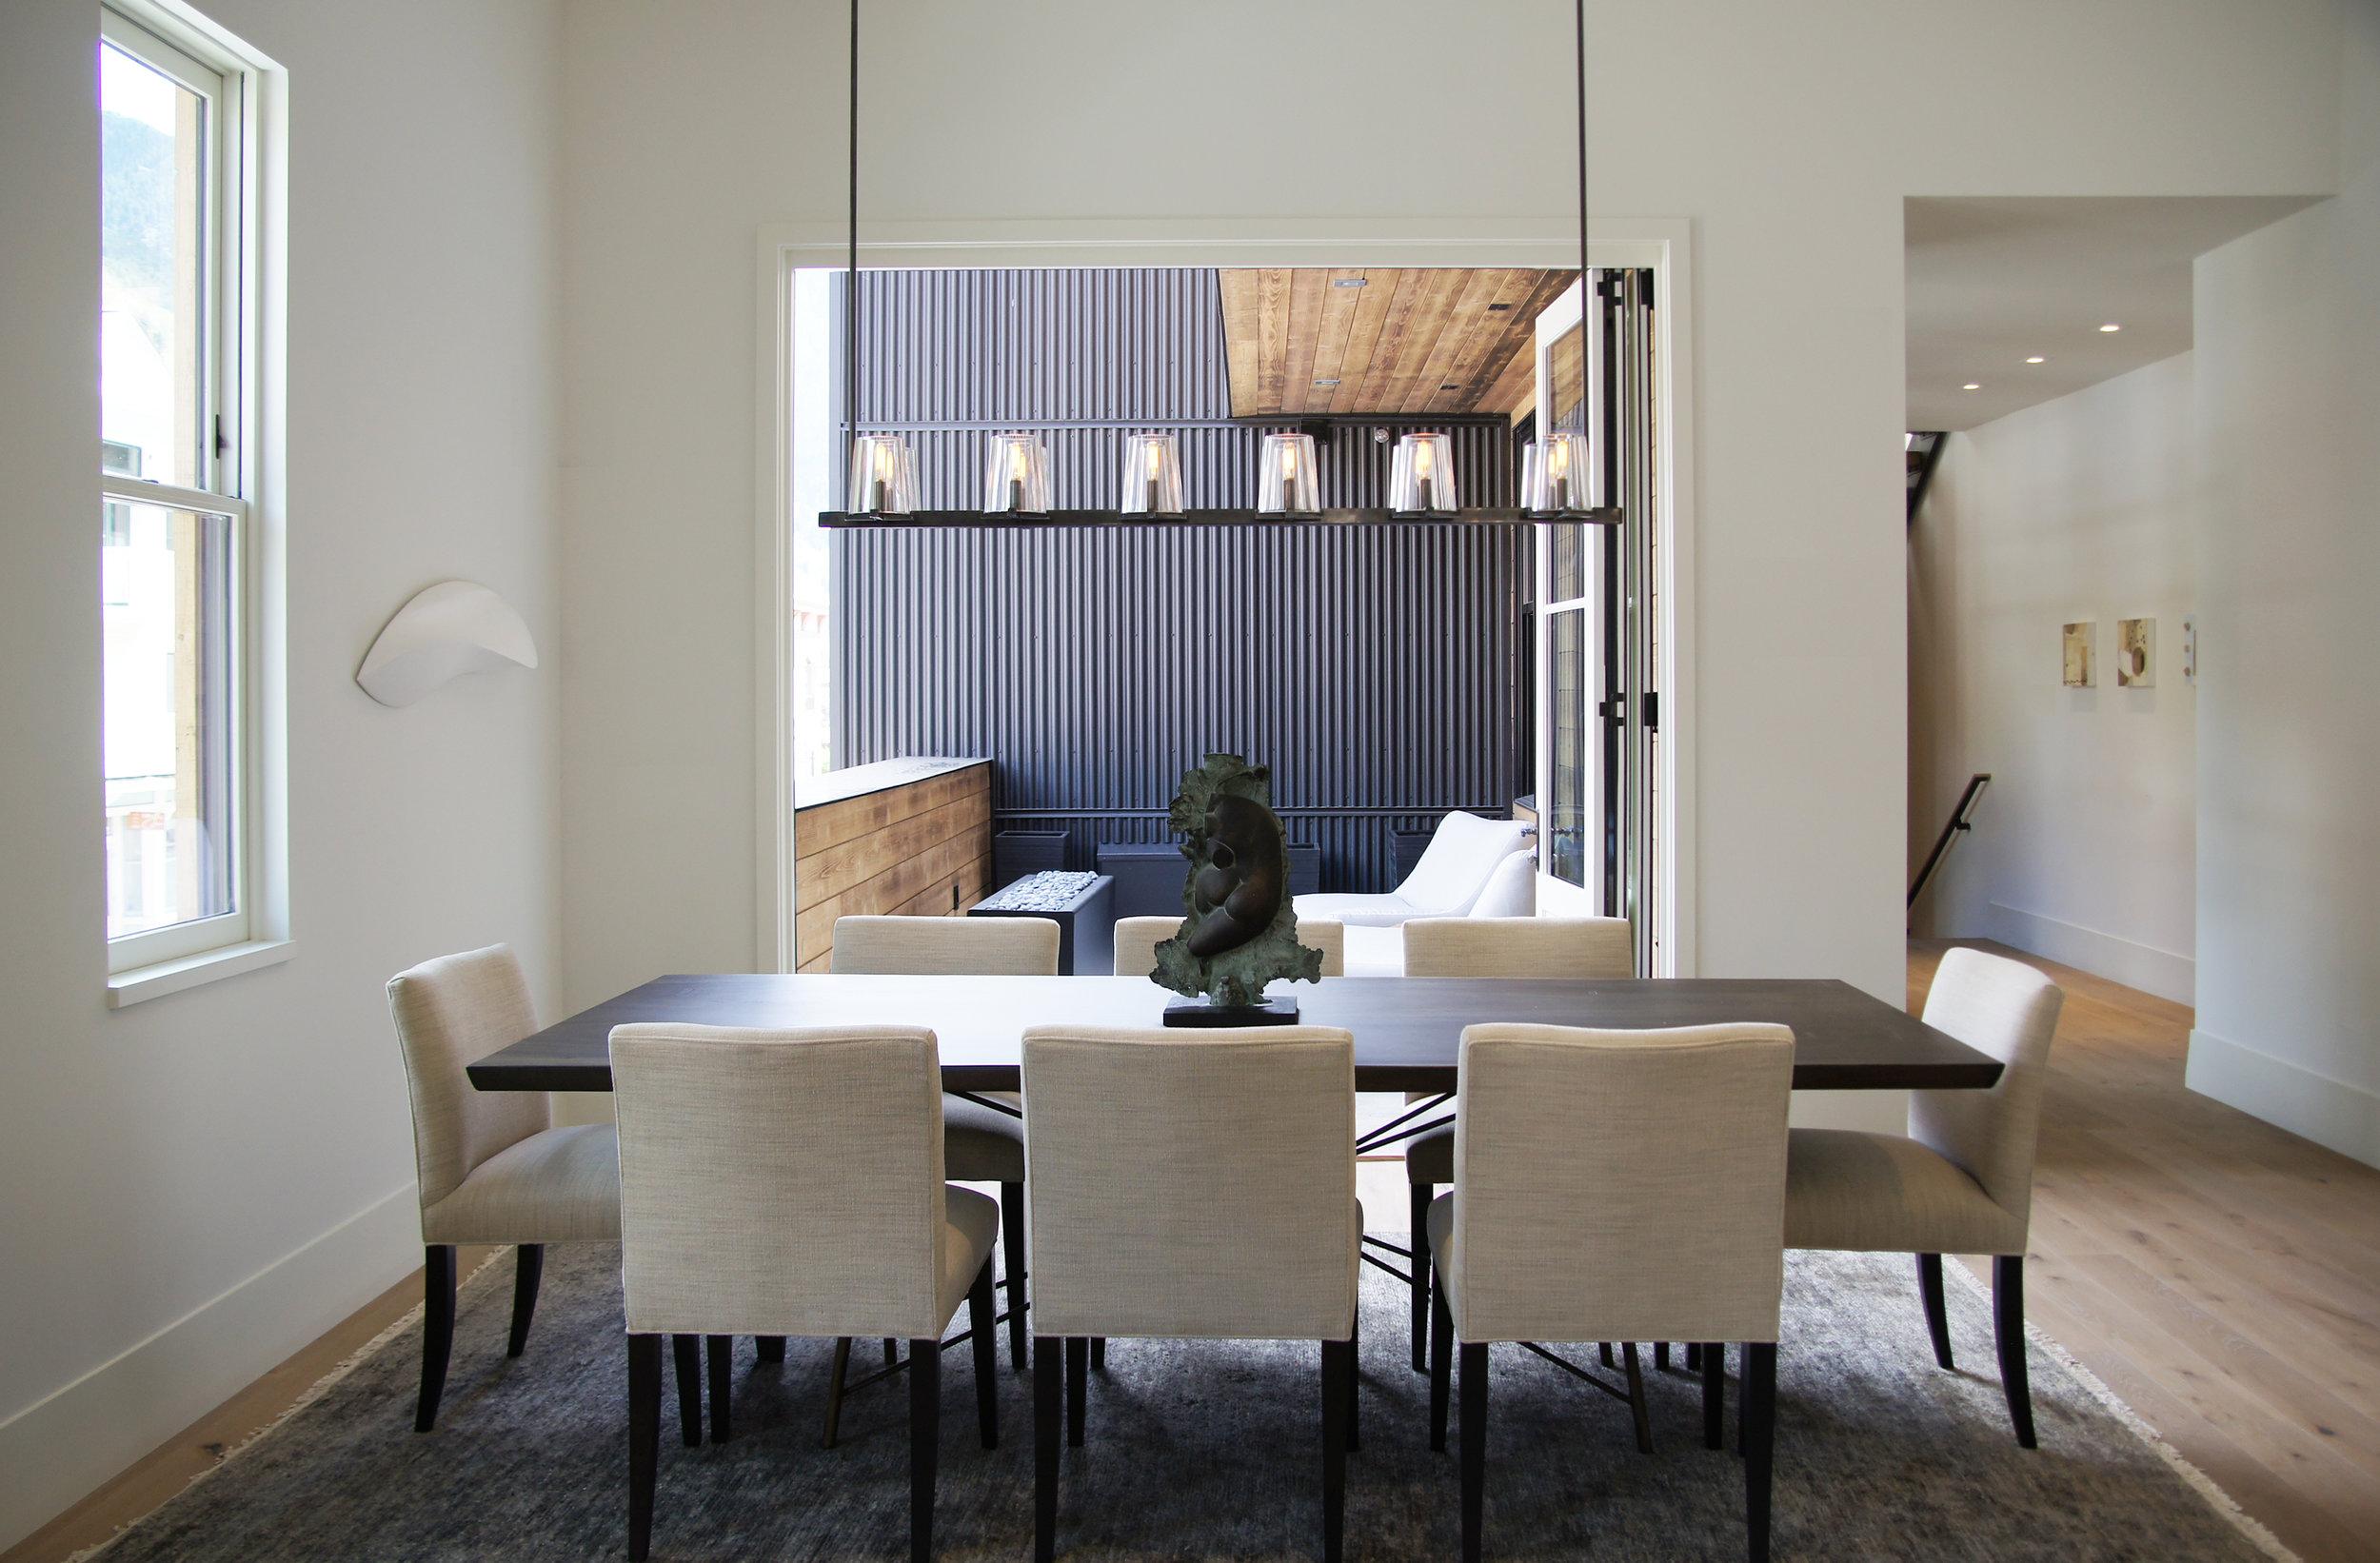 antonio marra - dining room.jpg